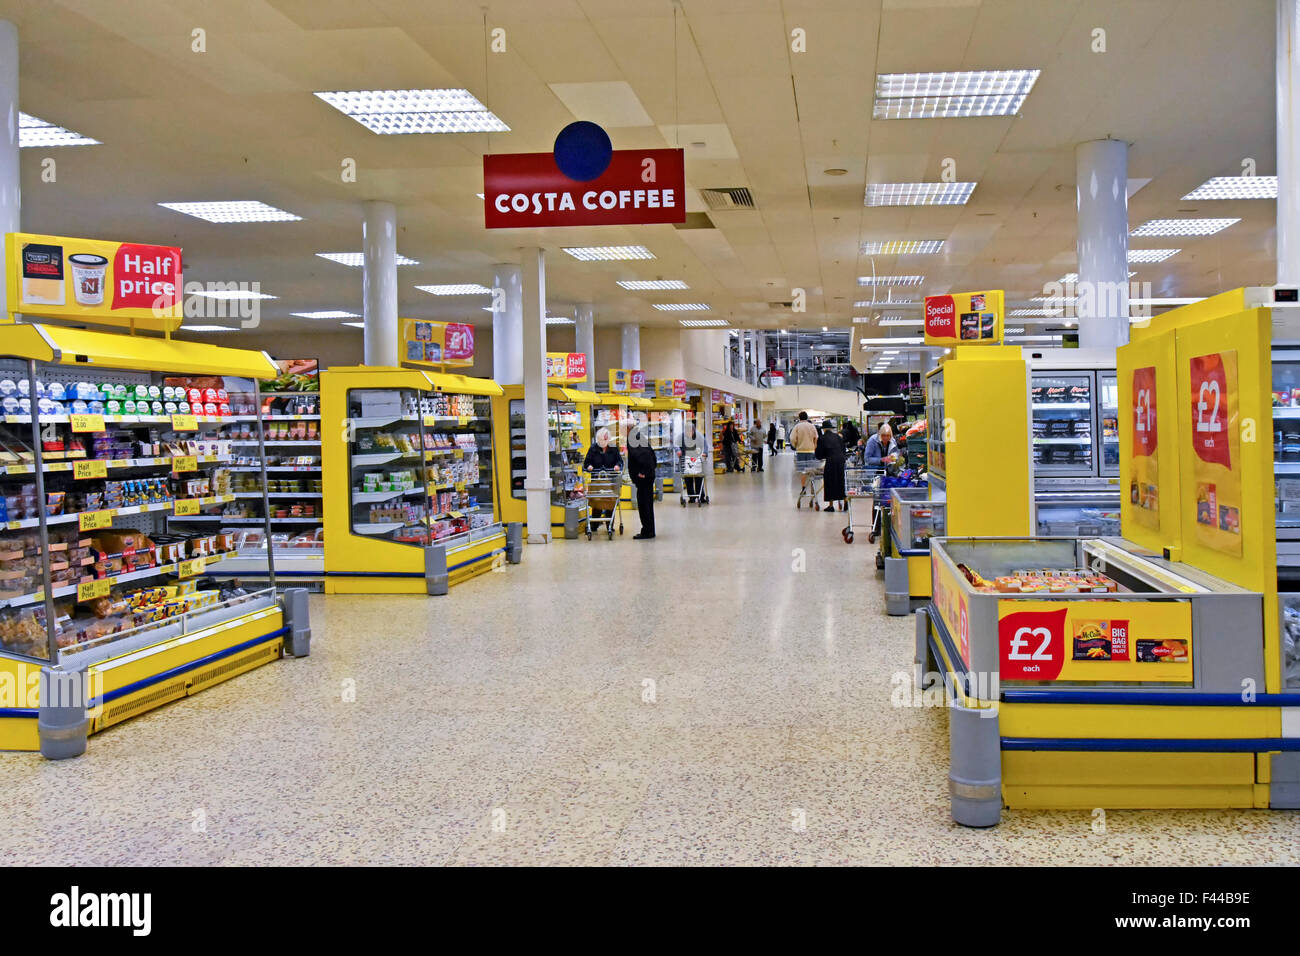 Costa Coffee sign for café facility interior Tesco Extra supermarket store London England UK - Stock Image